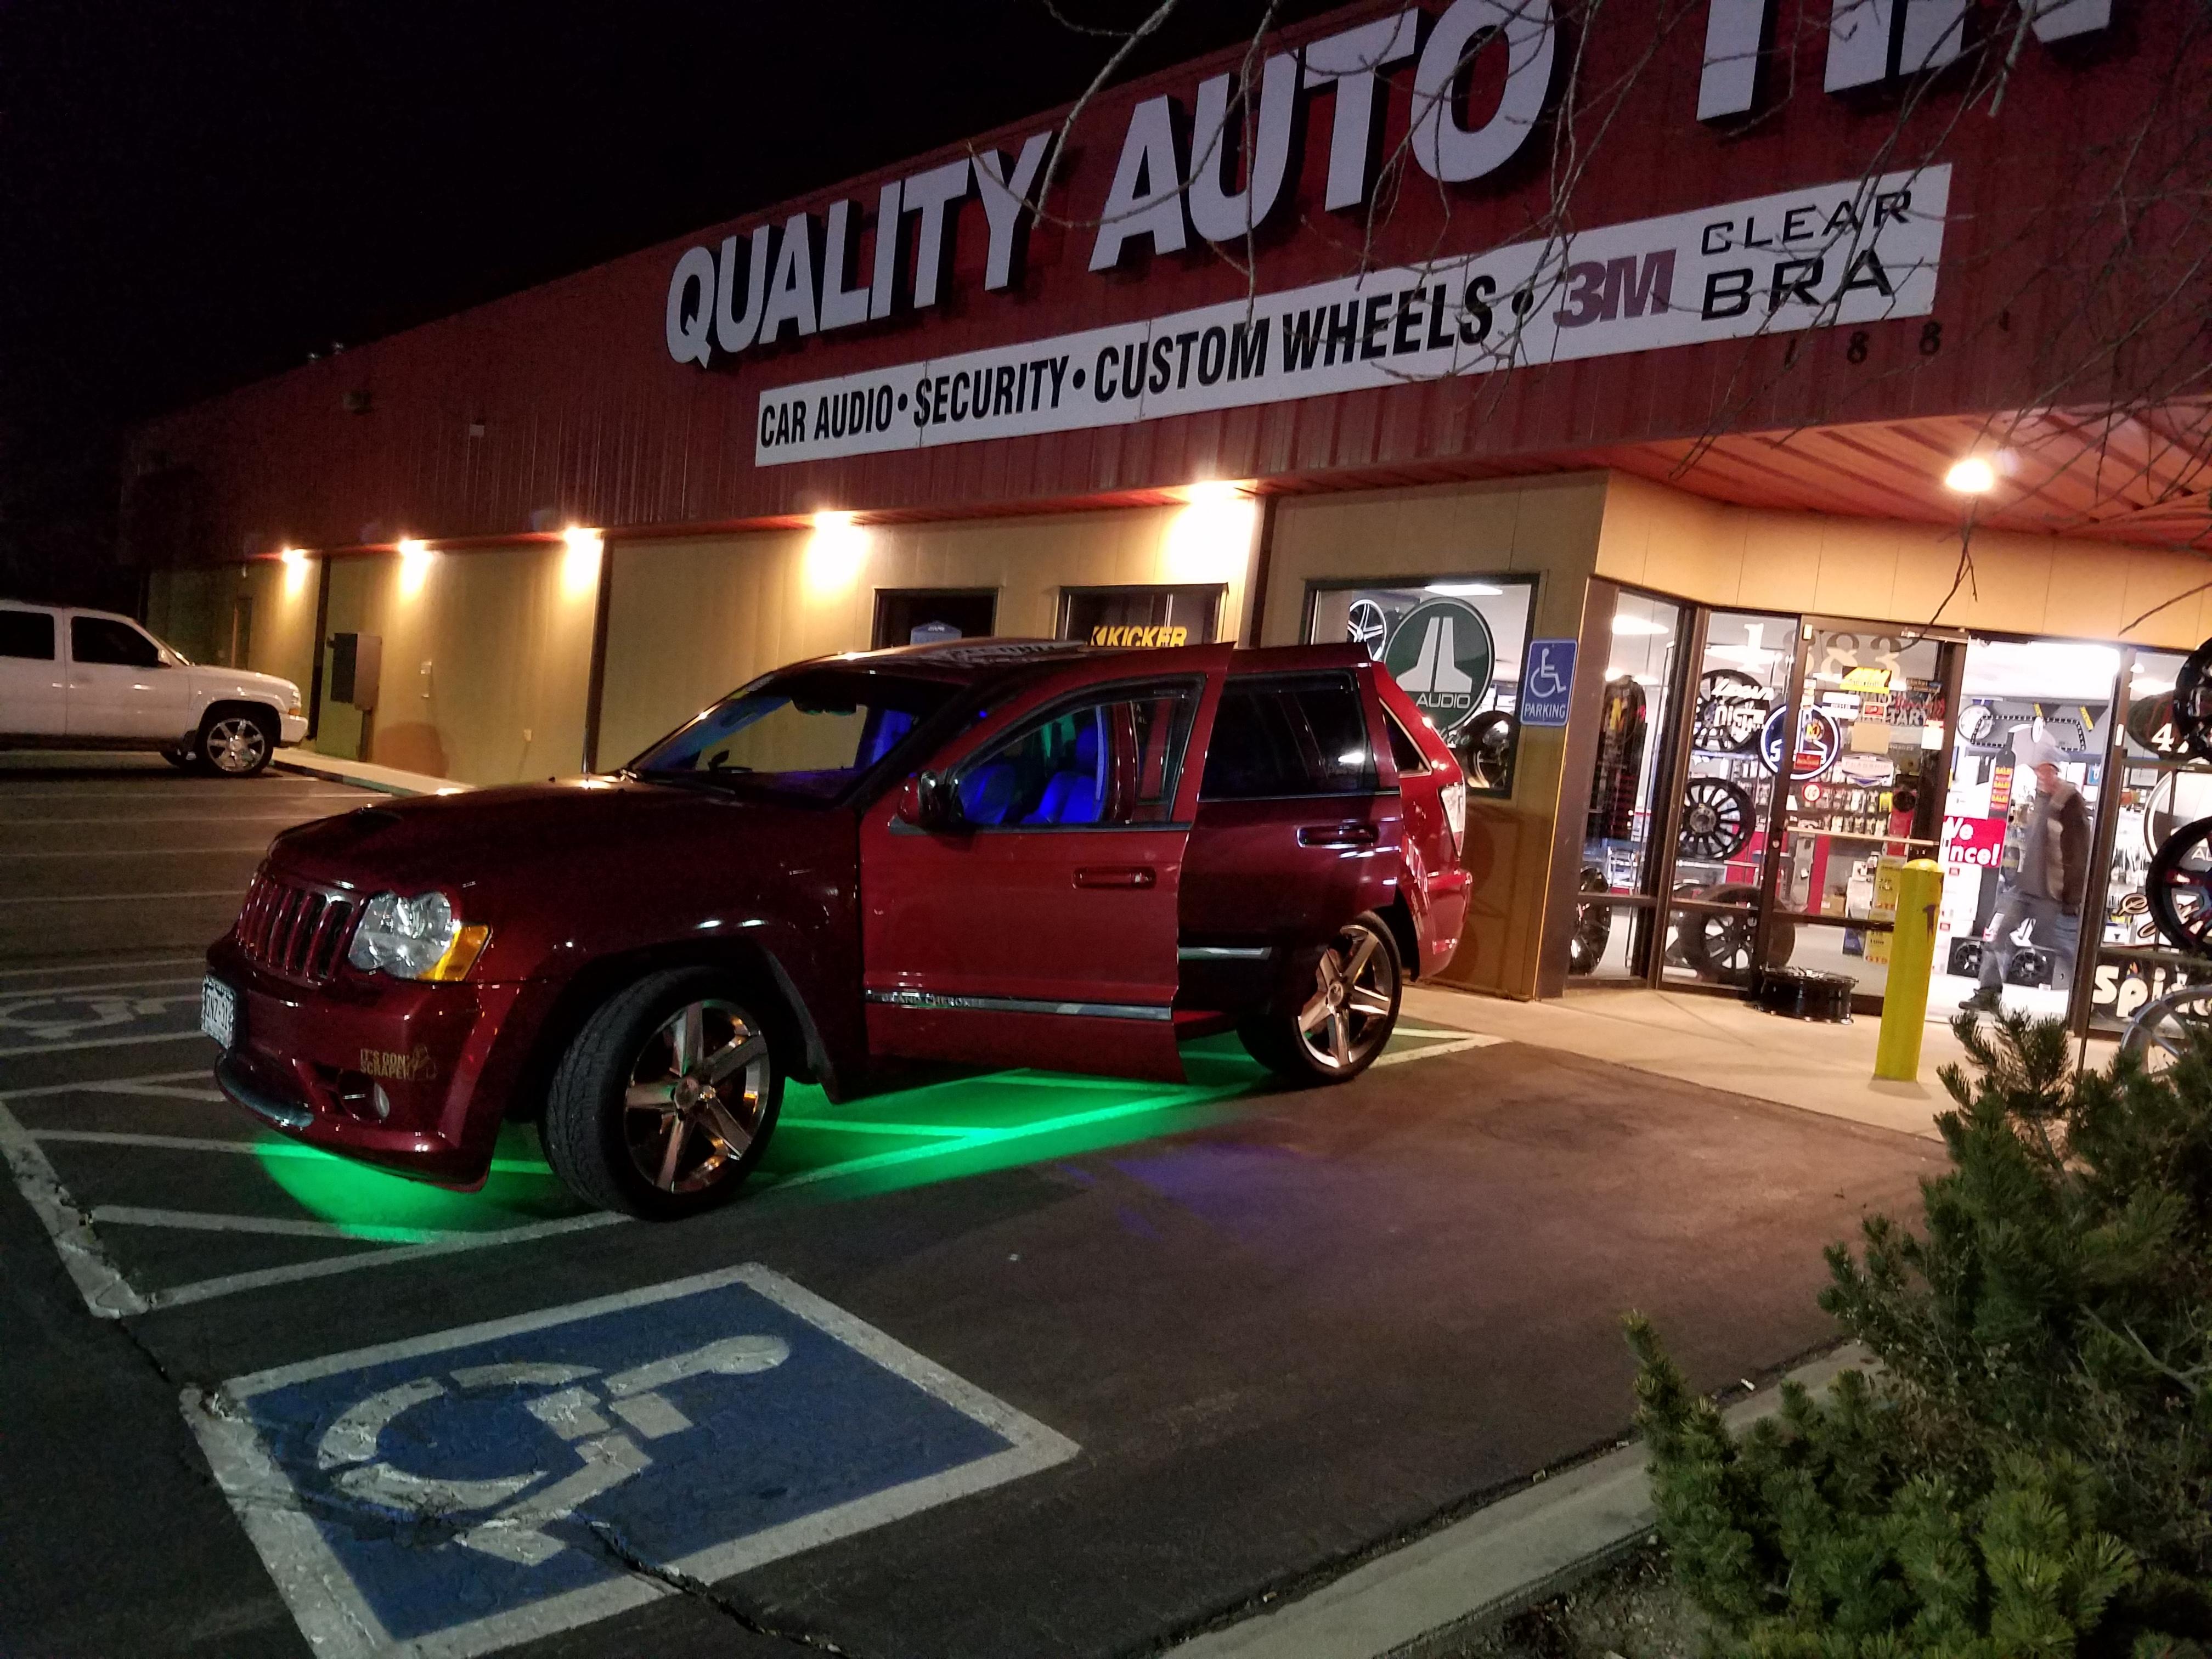 Quality Auto Performance Center image 0